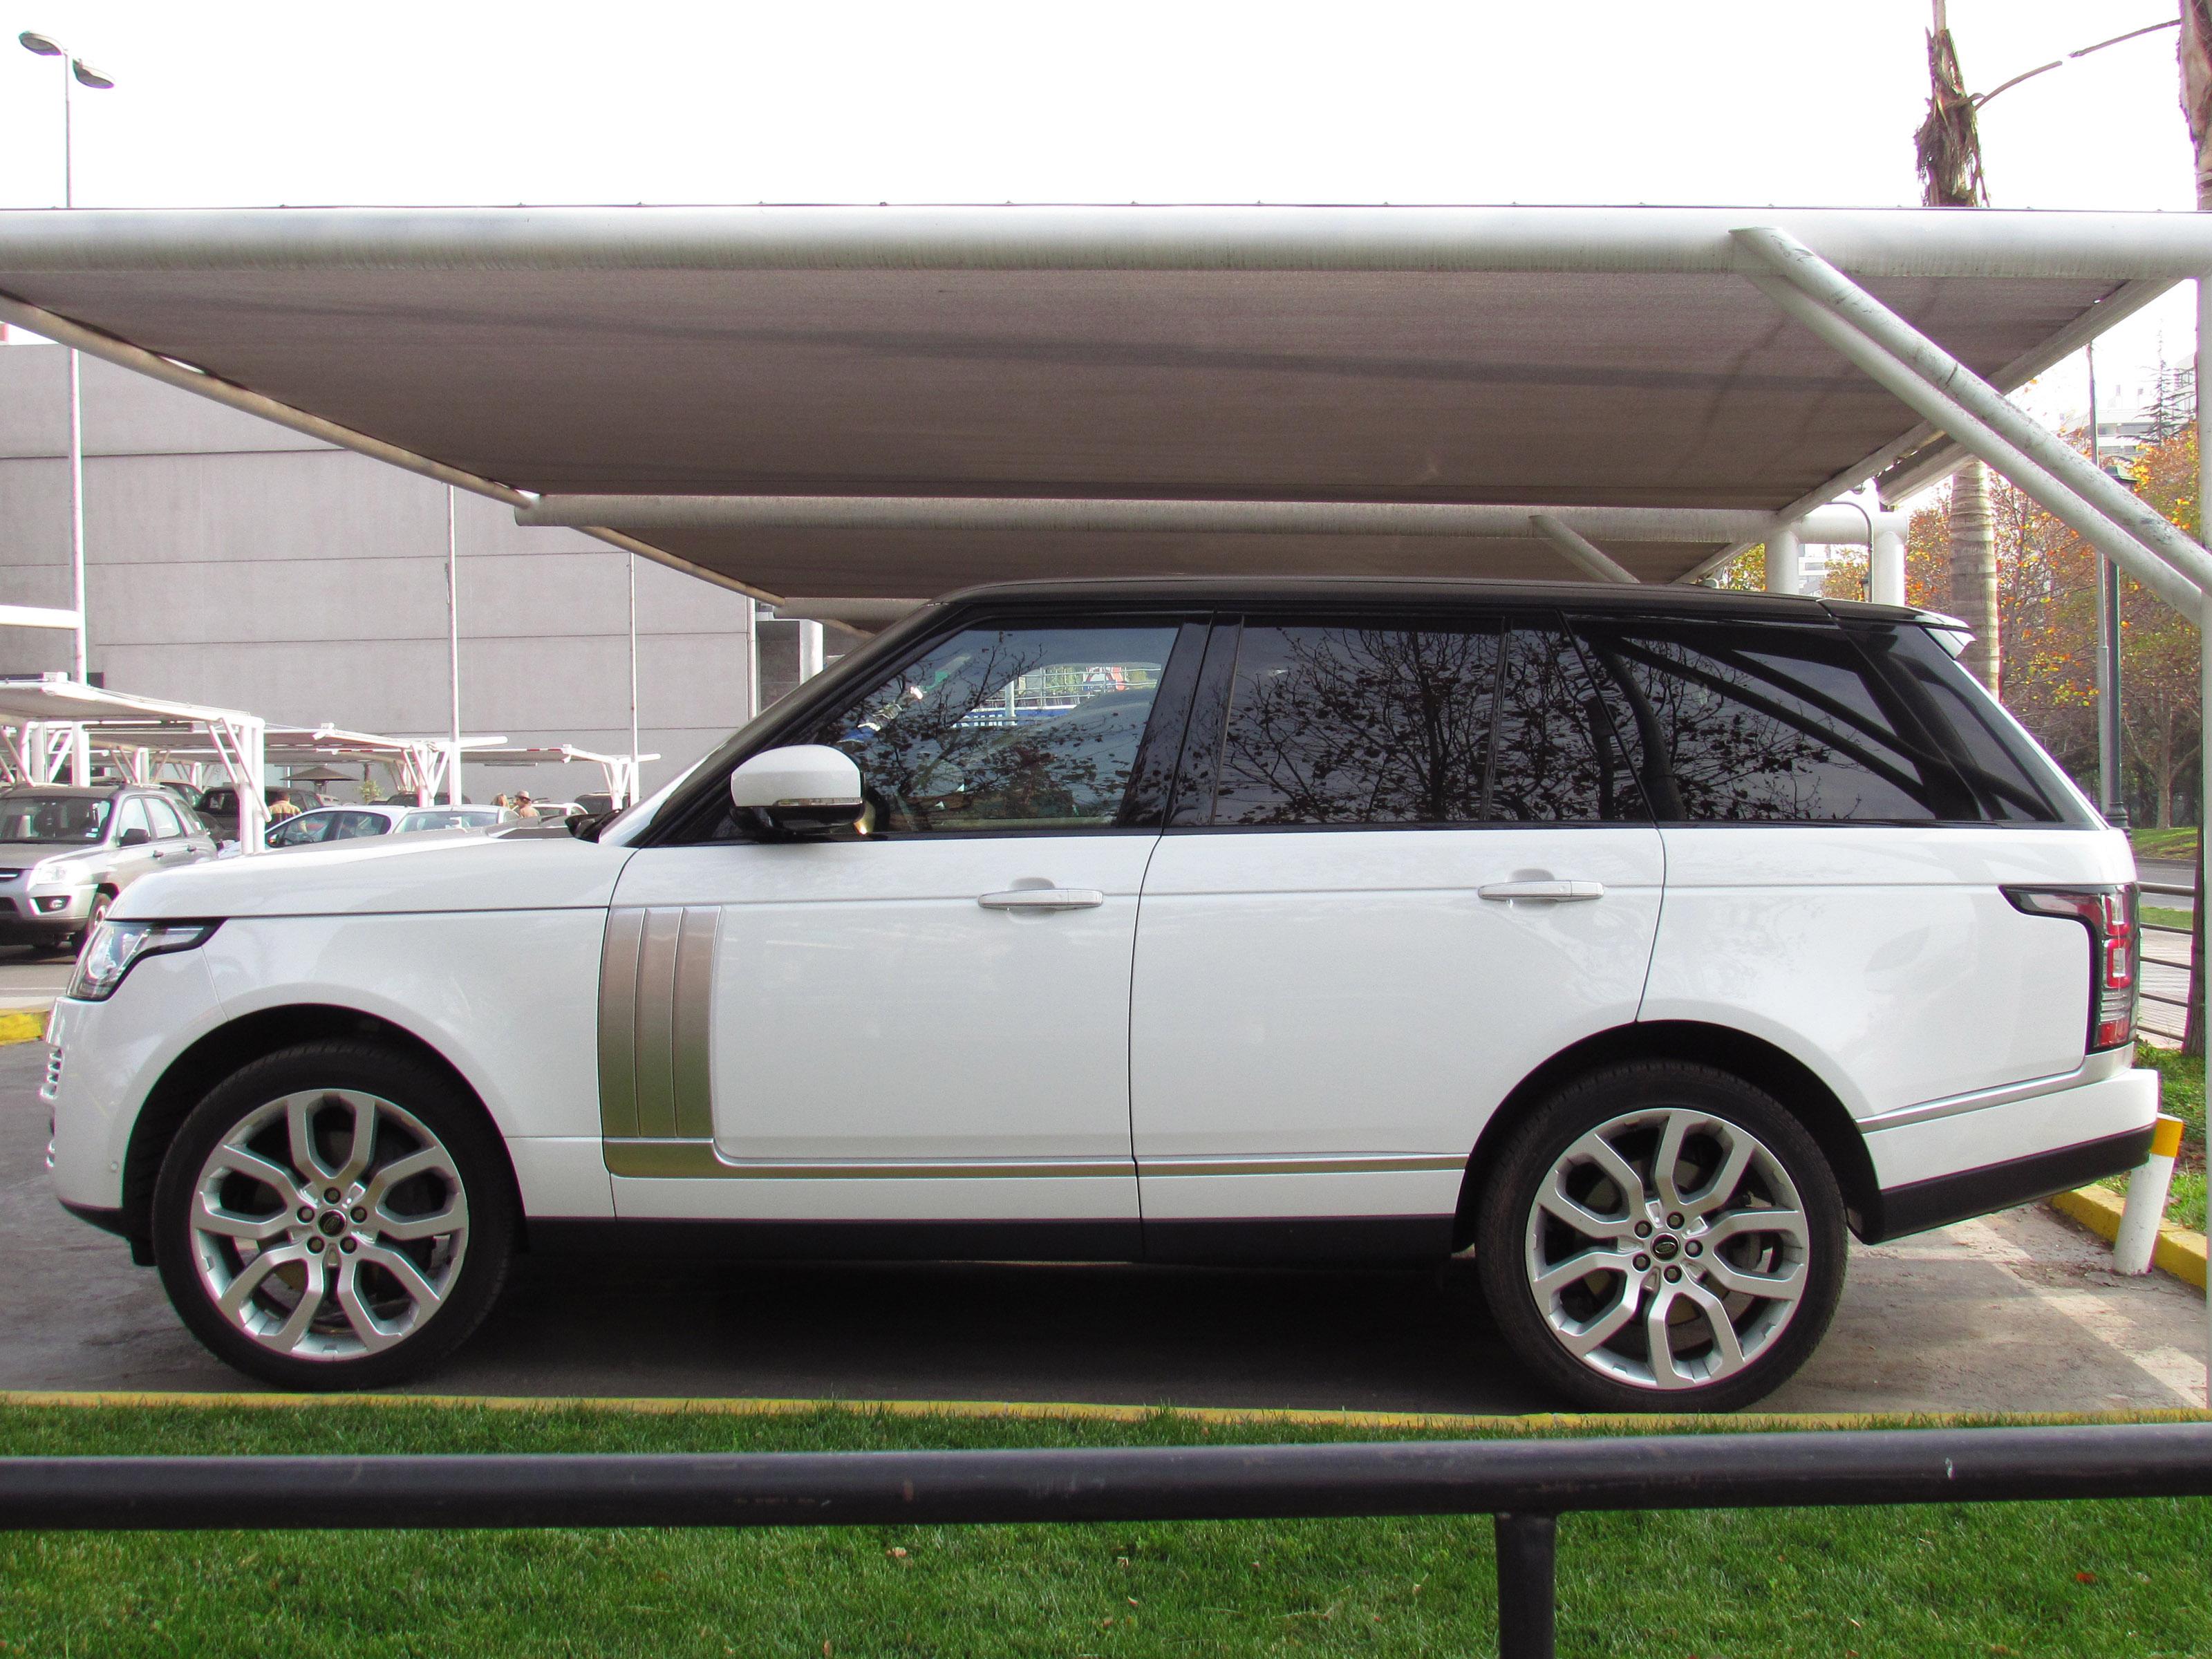 File:Land Rover Range Rover Vogue SE Supercharged 2014 ...